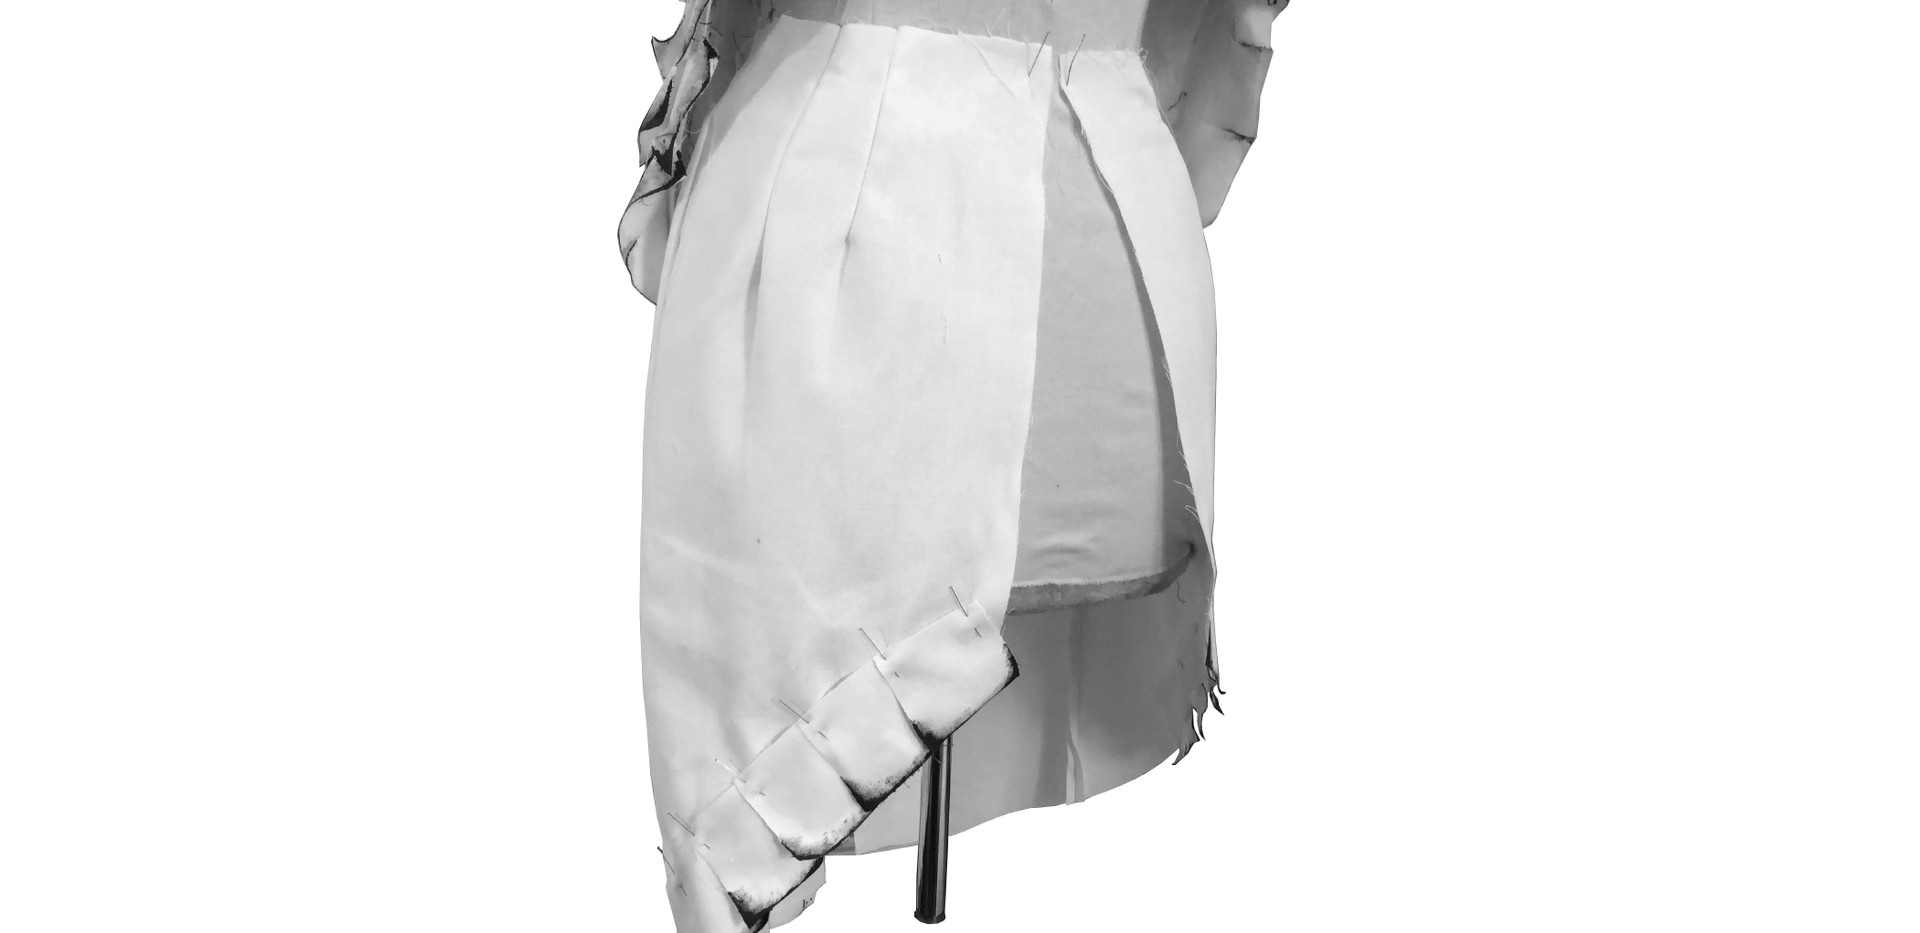 Skirt Post it Close up.jpg